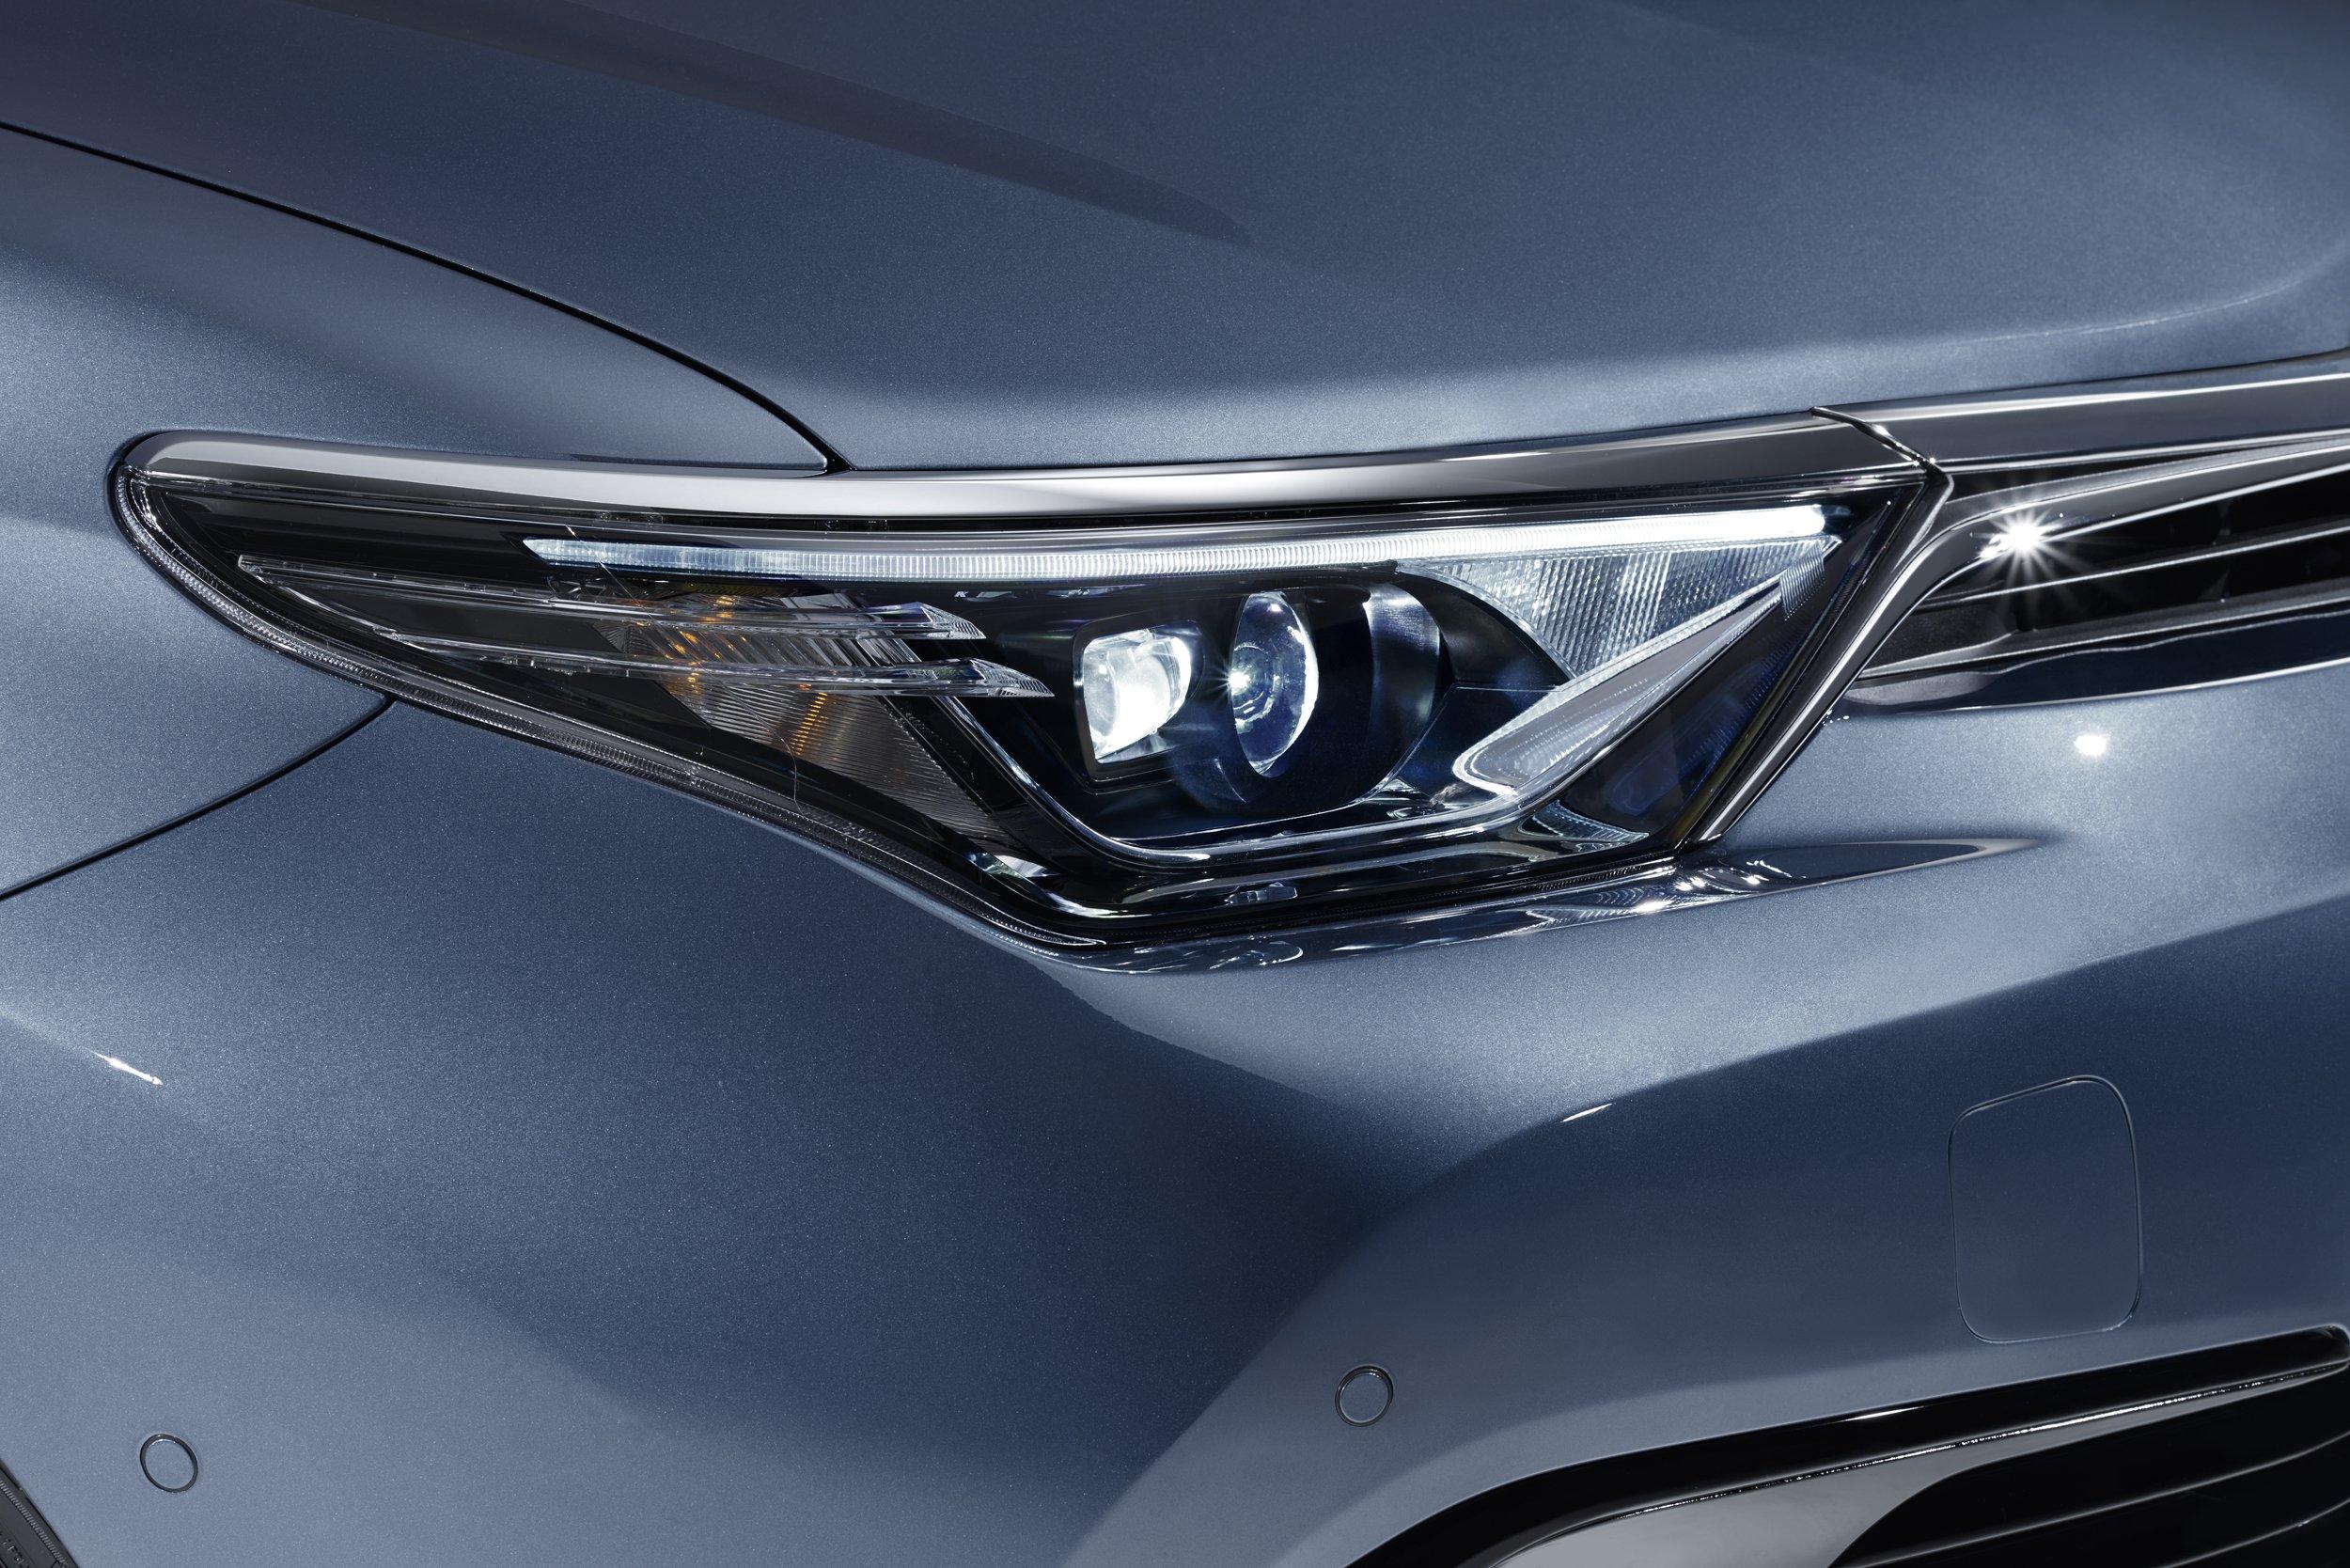 Toyota Auris Facelift Gets New 1 2 Litre Turbo Engine Paul